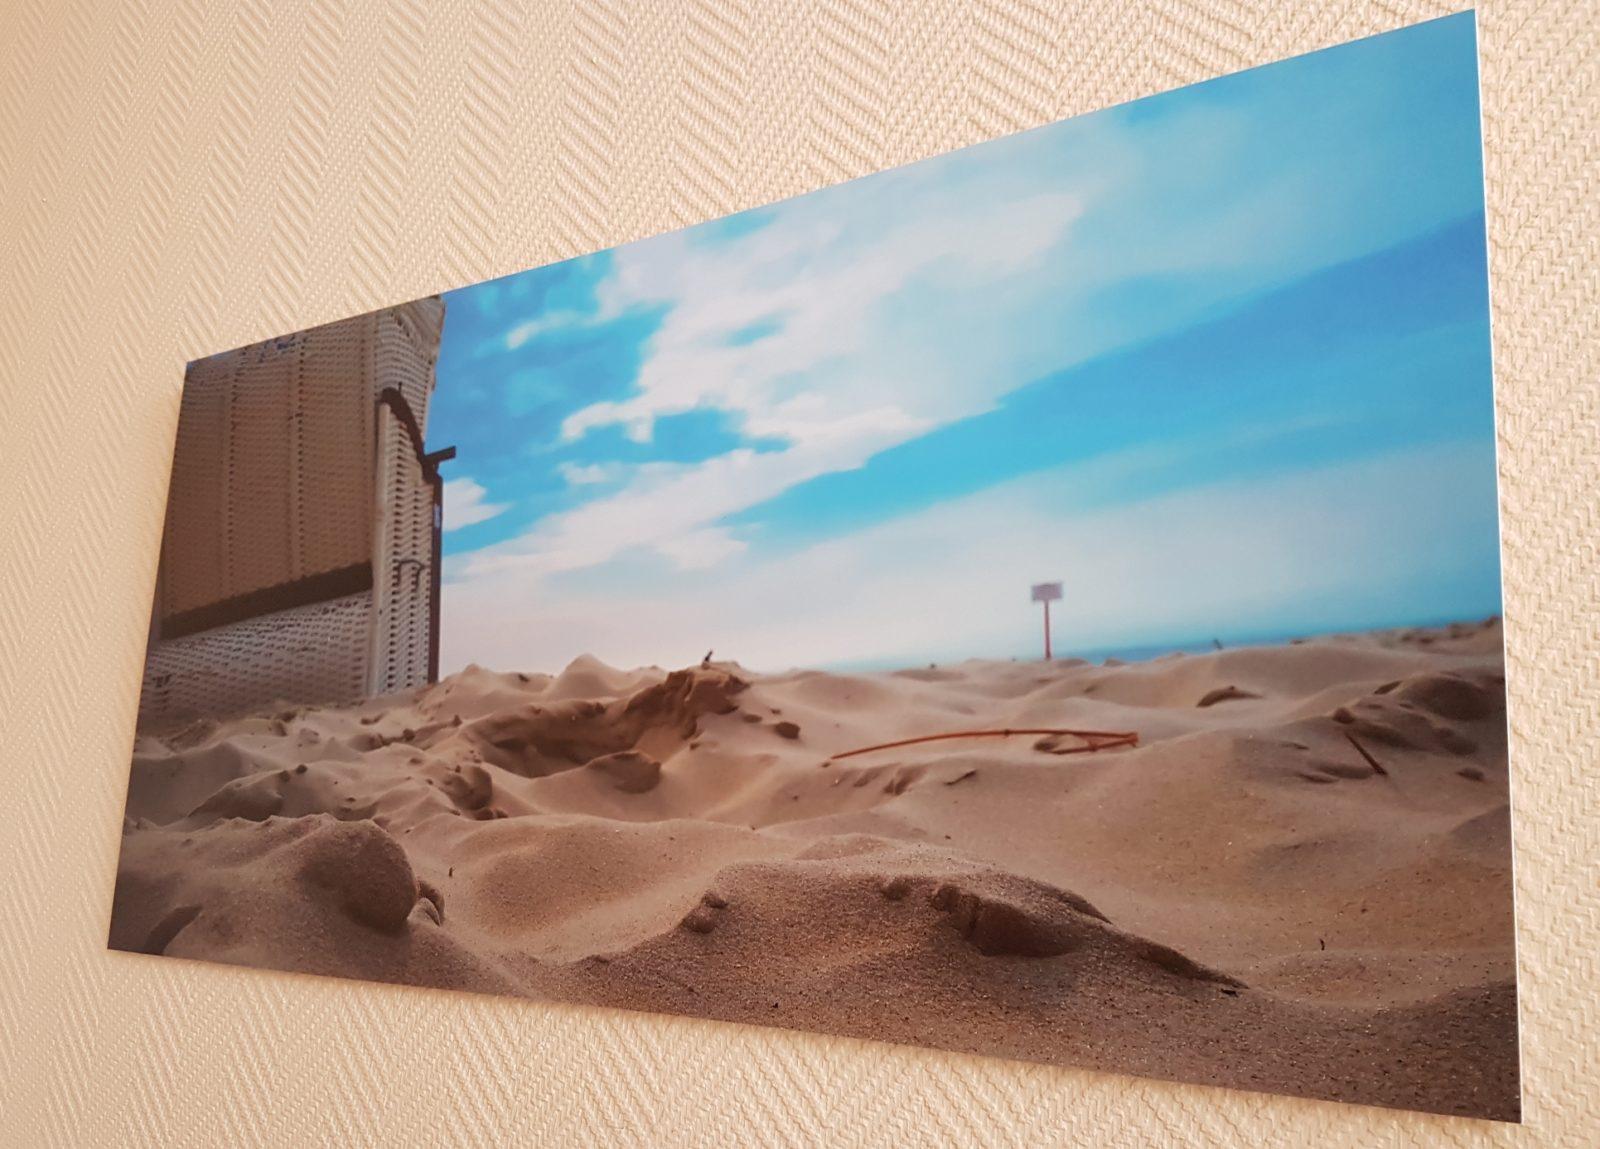 Bringt Farbe an die Wand! – Saal Digital Wandbild Test